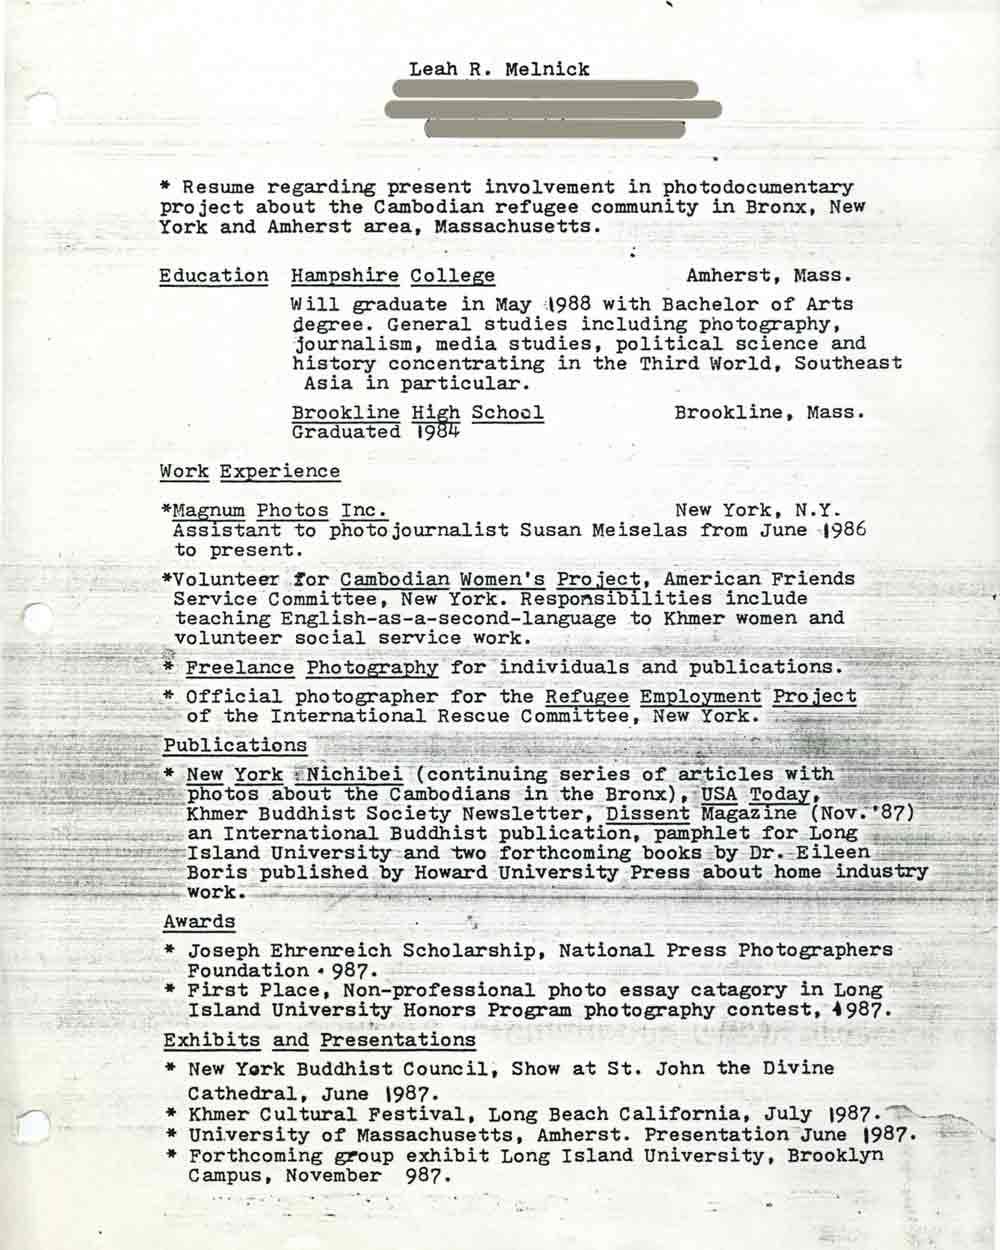 Leah Melnick's Resume, pg 1